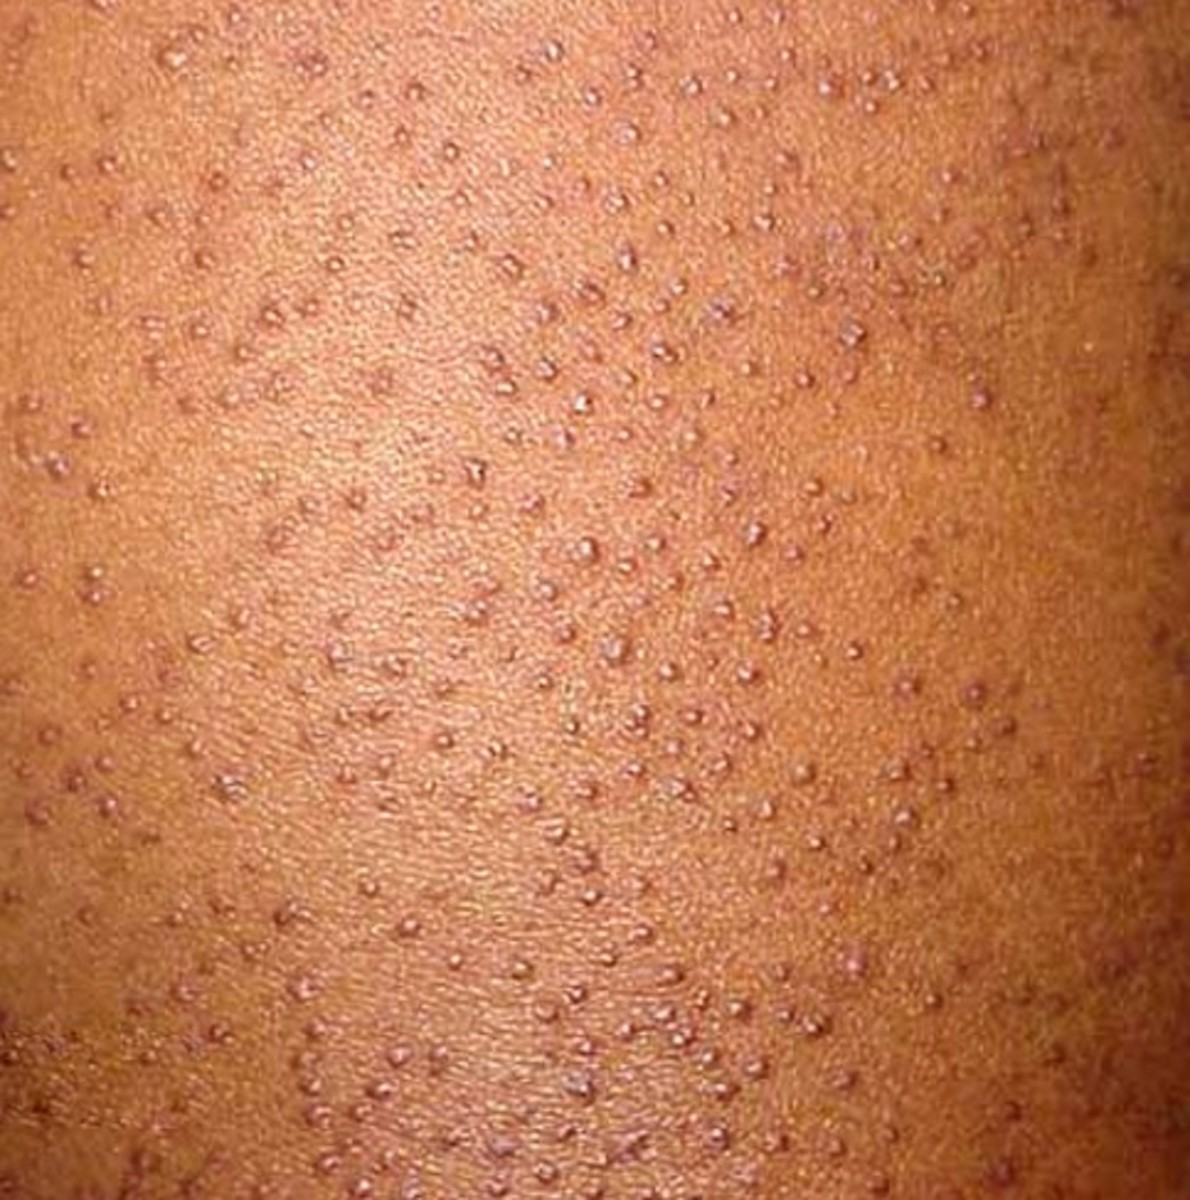 keratosis-pilaris-pictures-treatment-symptoms-and-causes